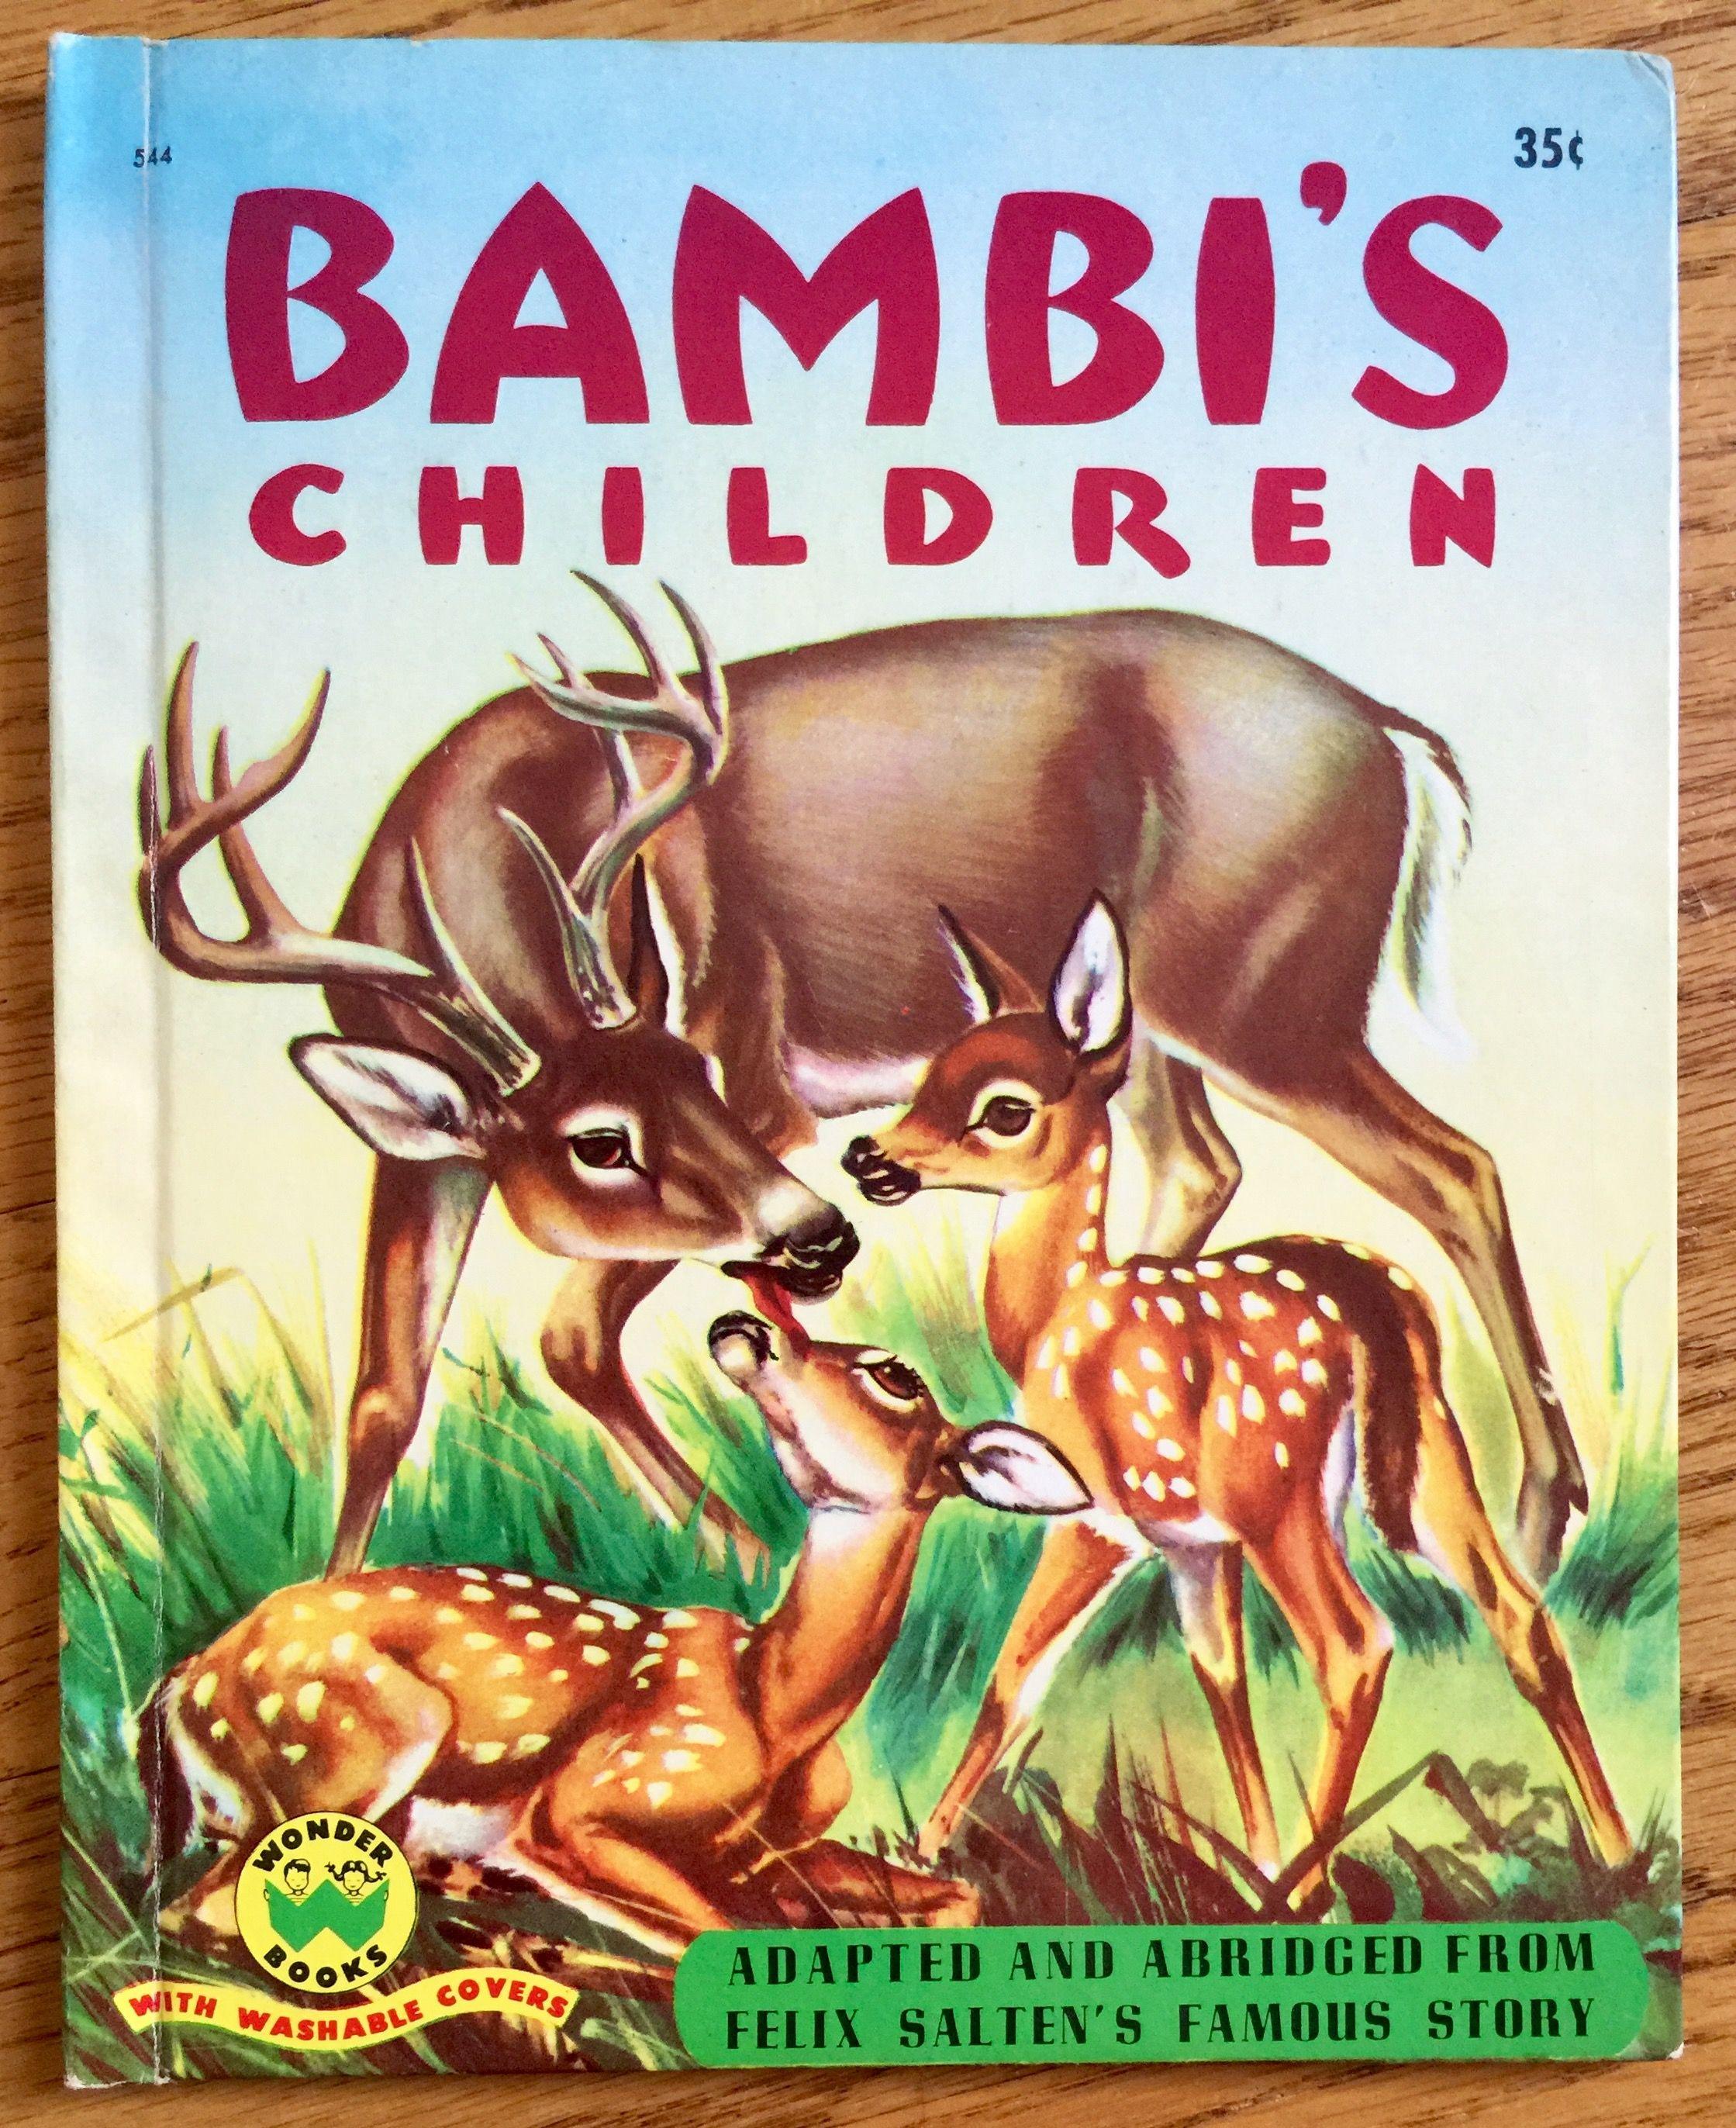 Bambi S Children By Felix Salten Hc 1951 Vgc Kids Story Books Wonder Book Children S Book Illustration